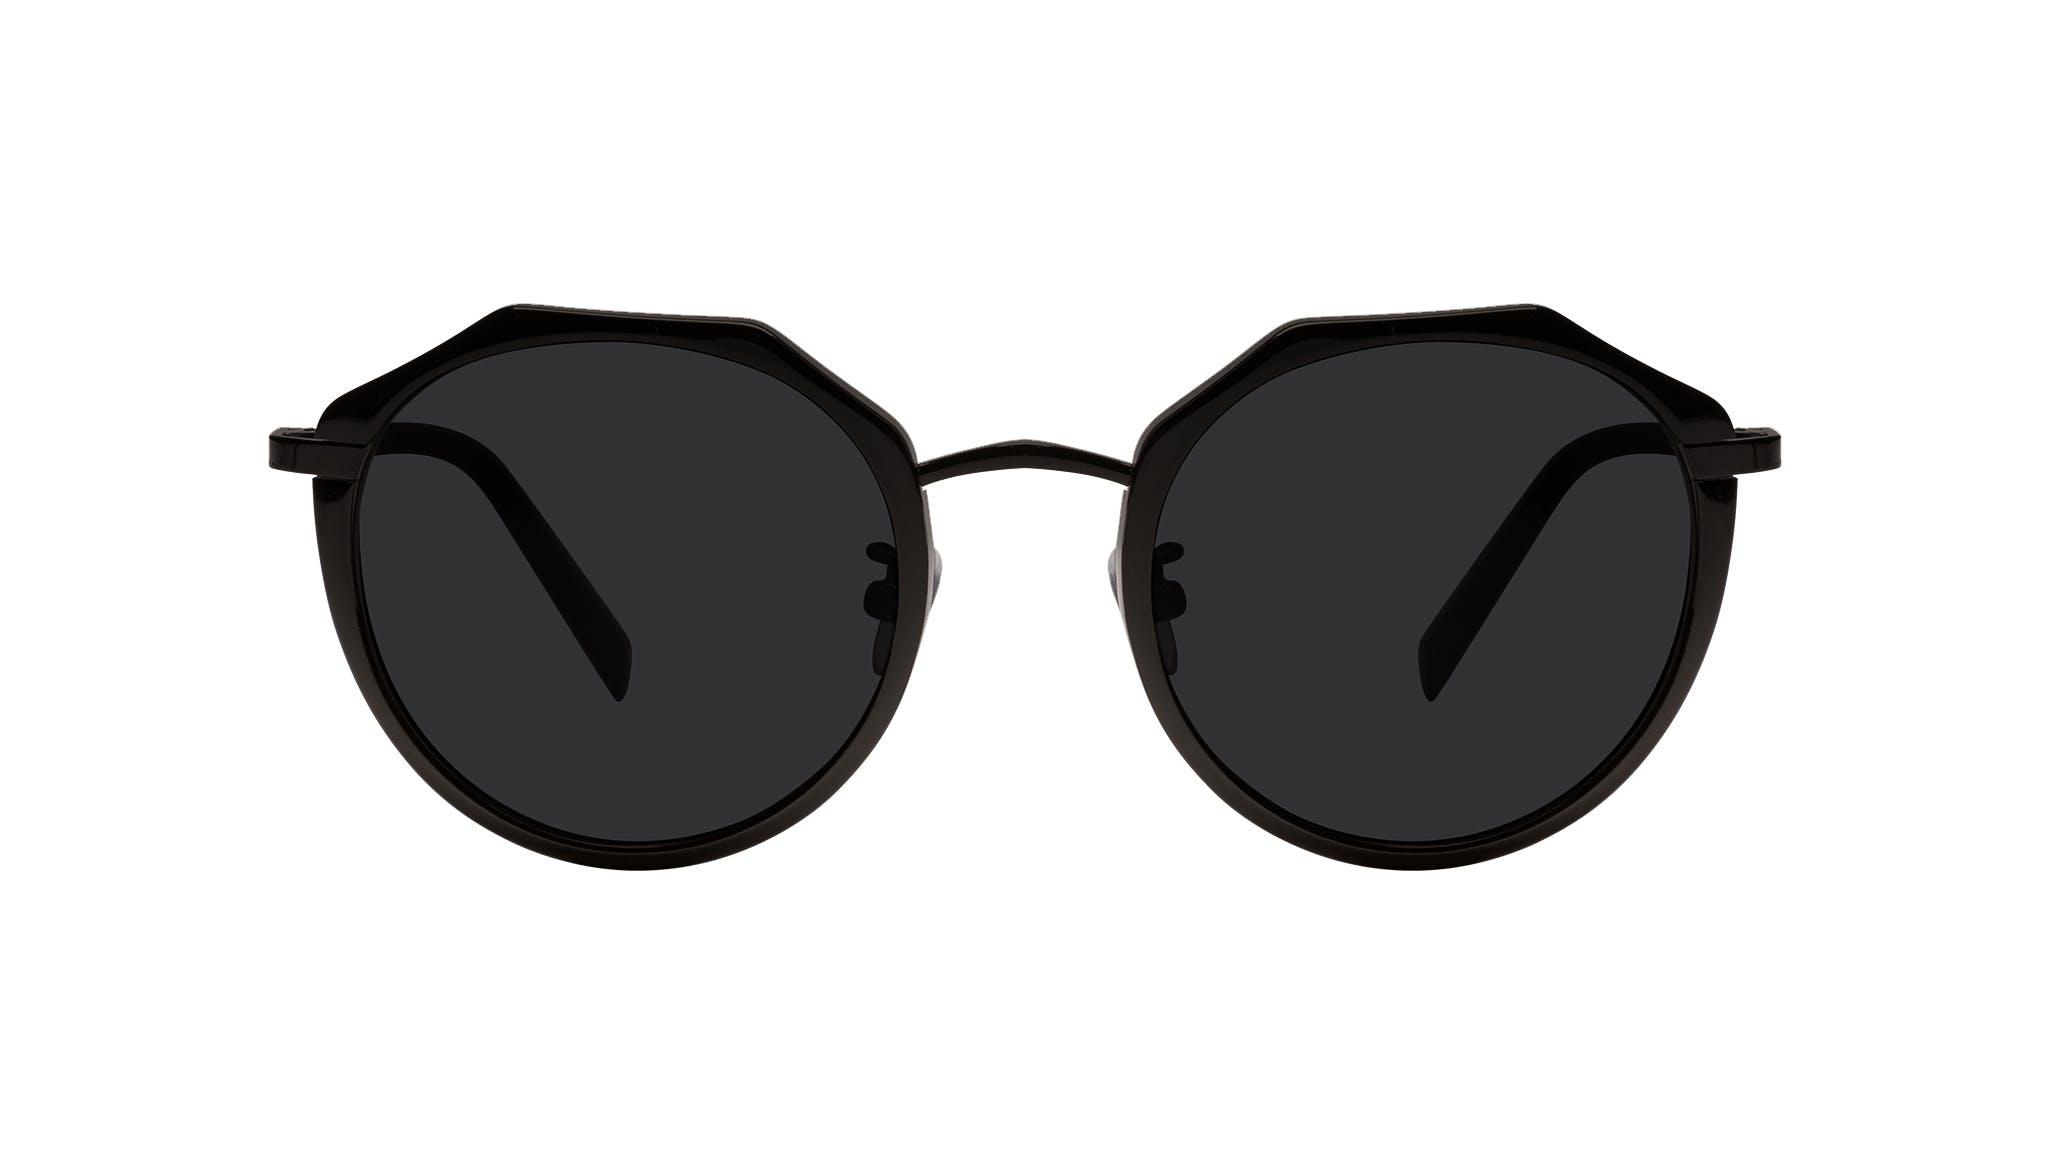 Affordable Fashion Glasses Round Sunglasses Women Womance Matte